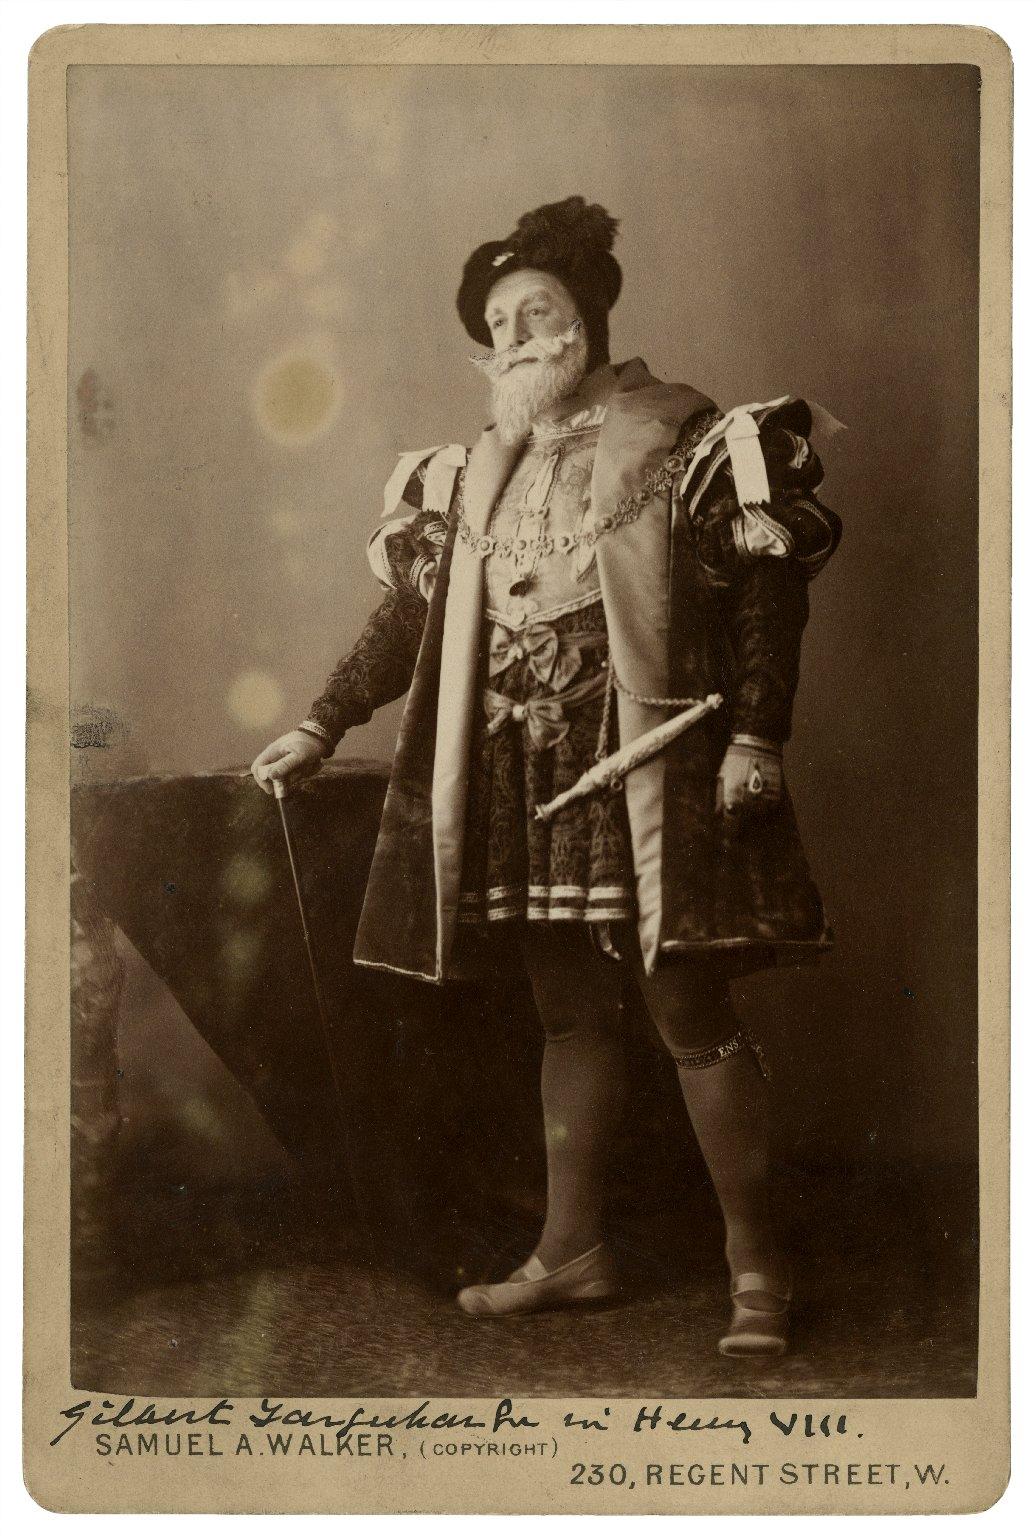 Gilbert Farquhar in [Shakespeare's] Henry VIII [graphic] / Samuel A. Walker (copyright).